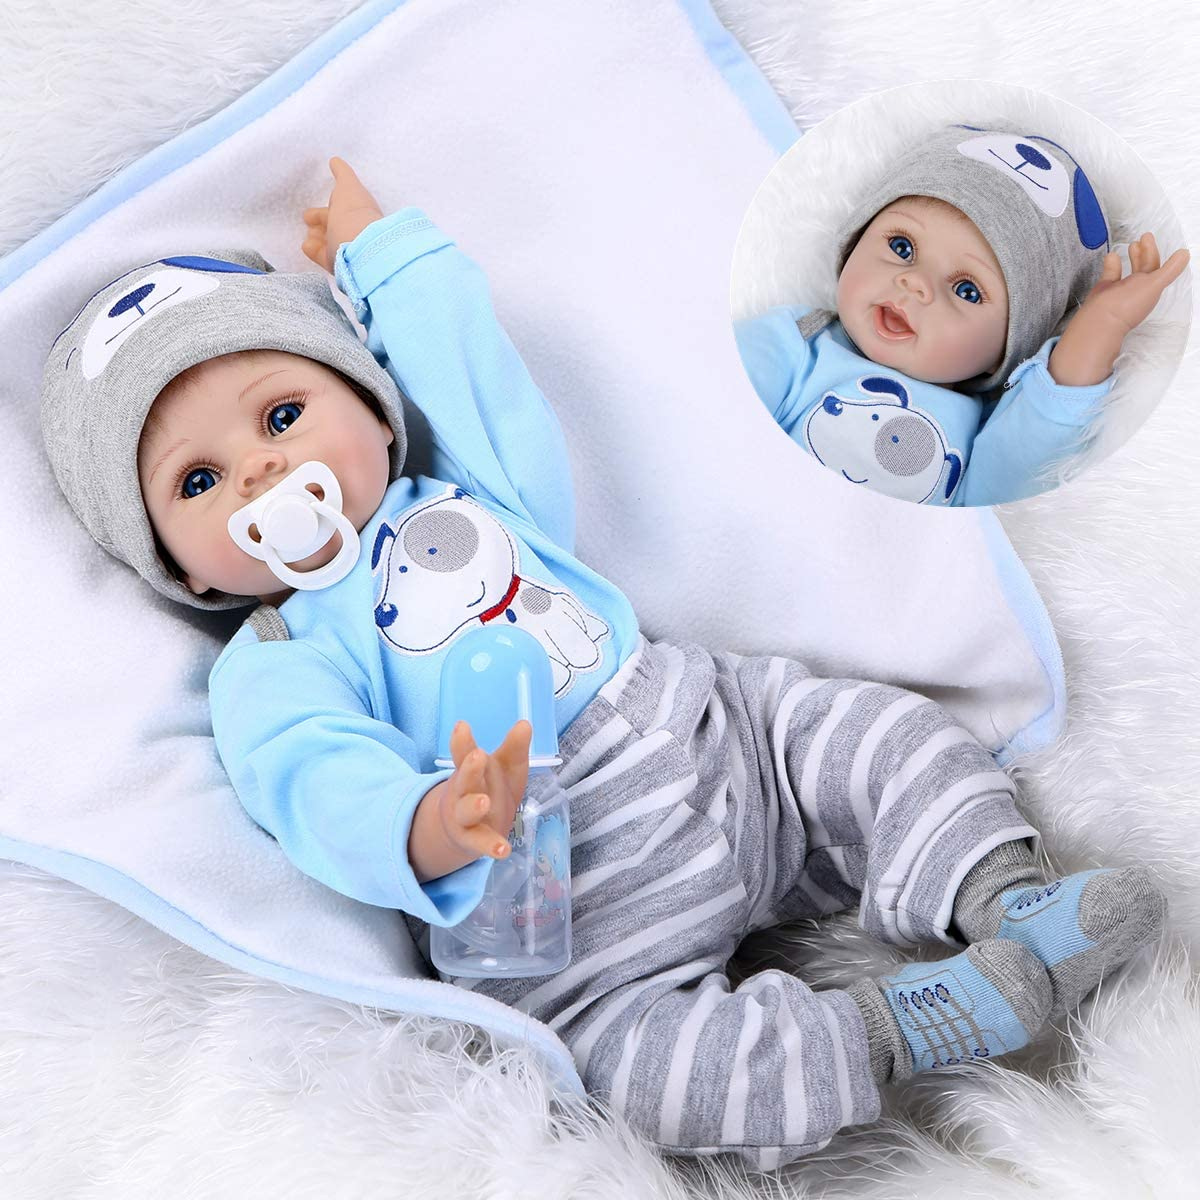 22/'/' Reborn Newborn Dolls NPKDOLL Vinyl Silicone Baby Boy Doll Xmas Toy+Clothes